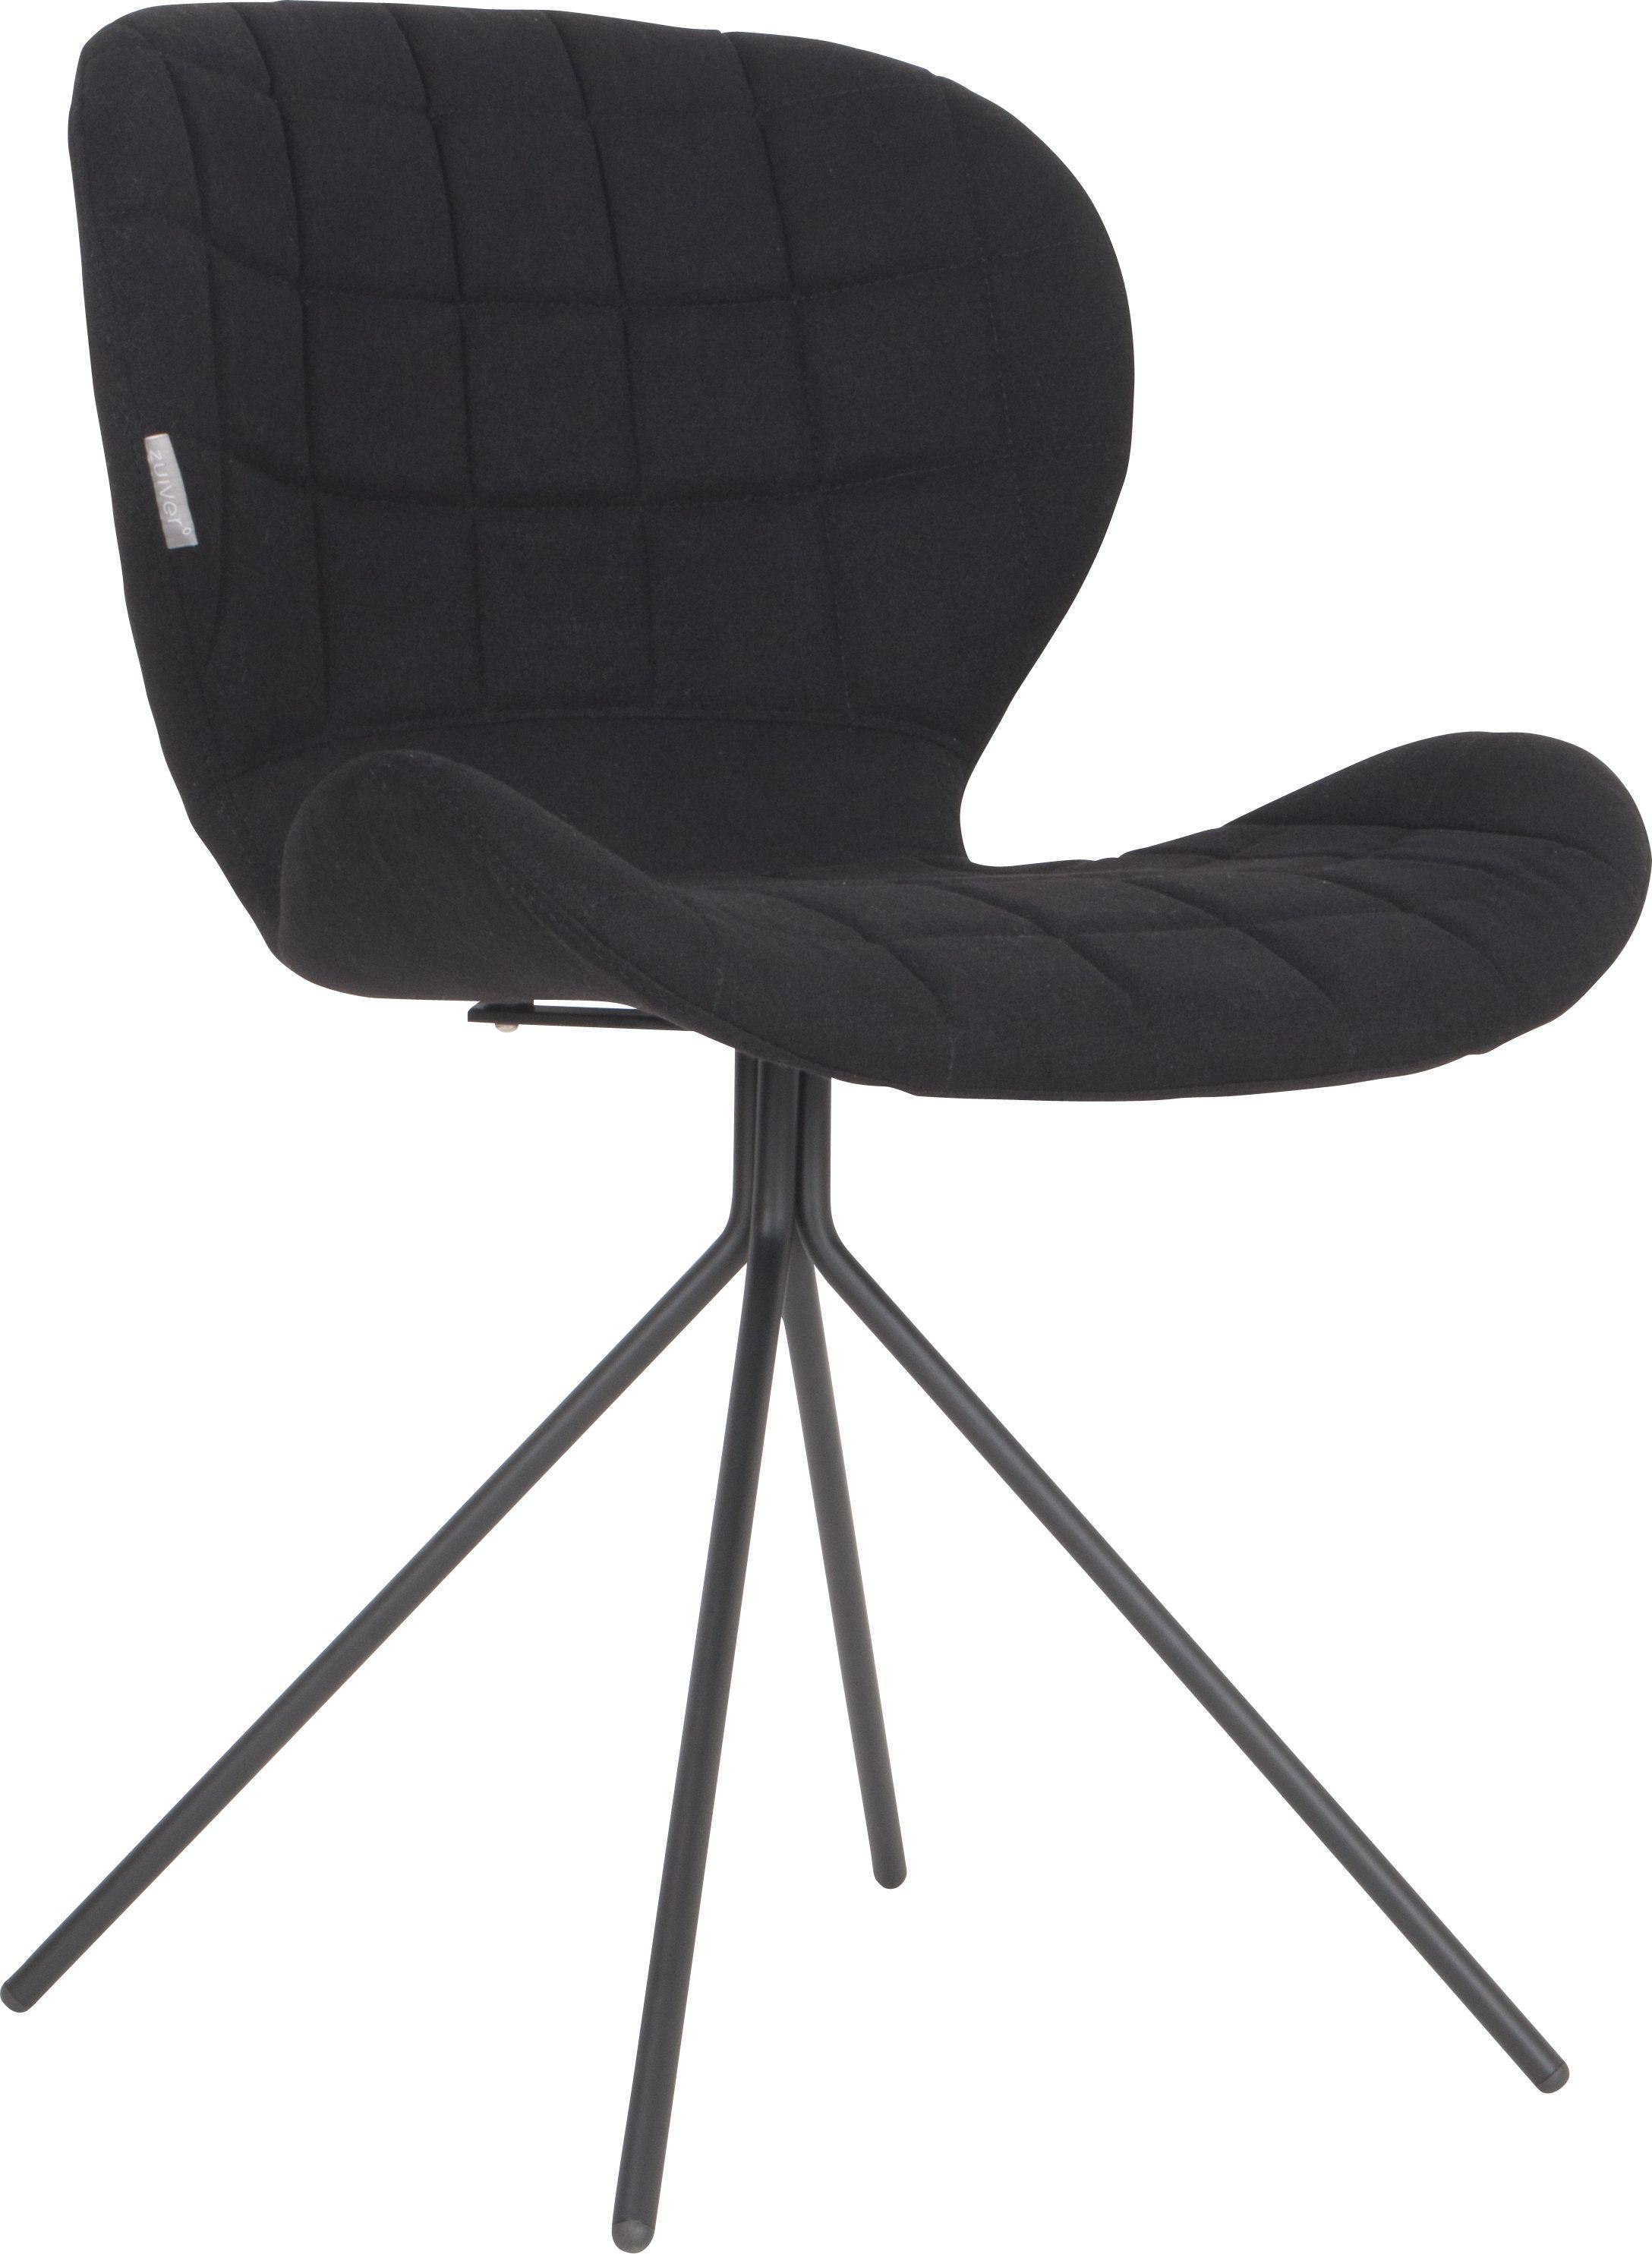 OMG black chair